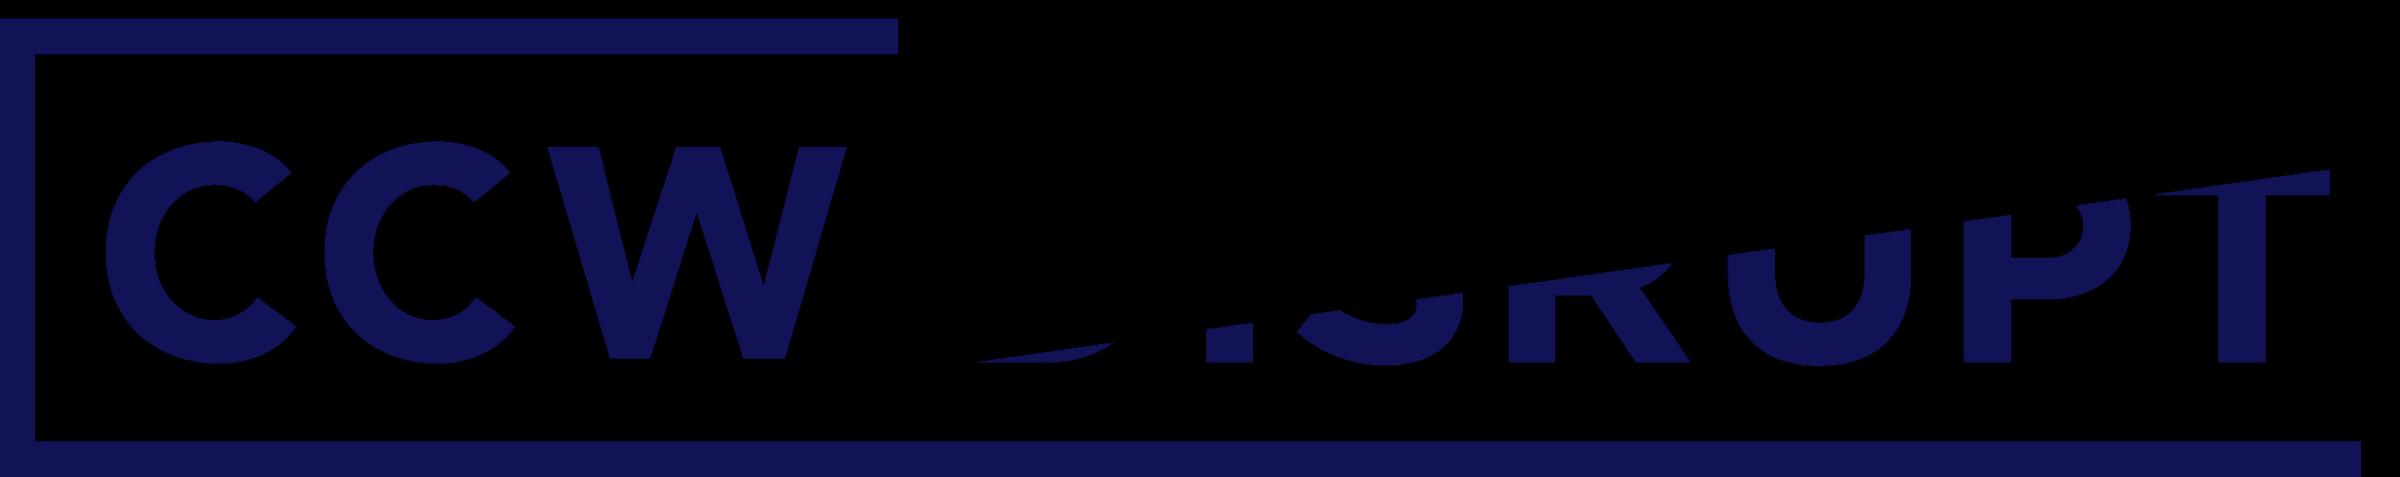 Customer Contact Week Australia 2021